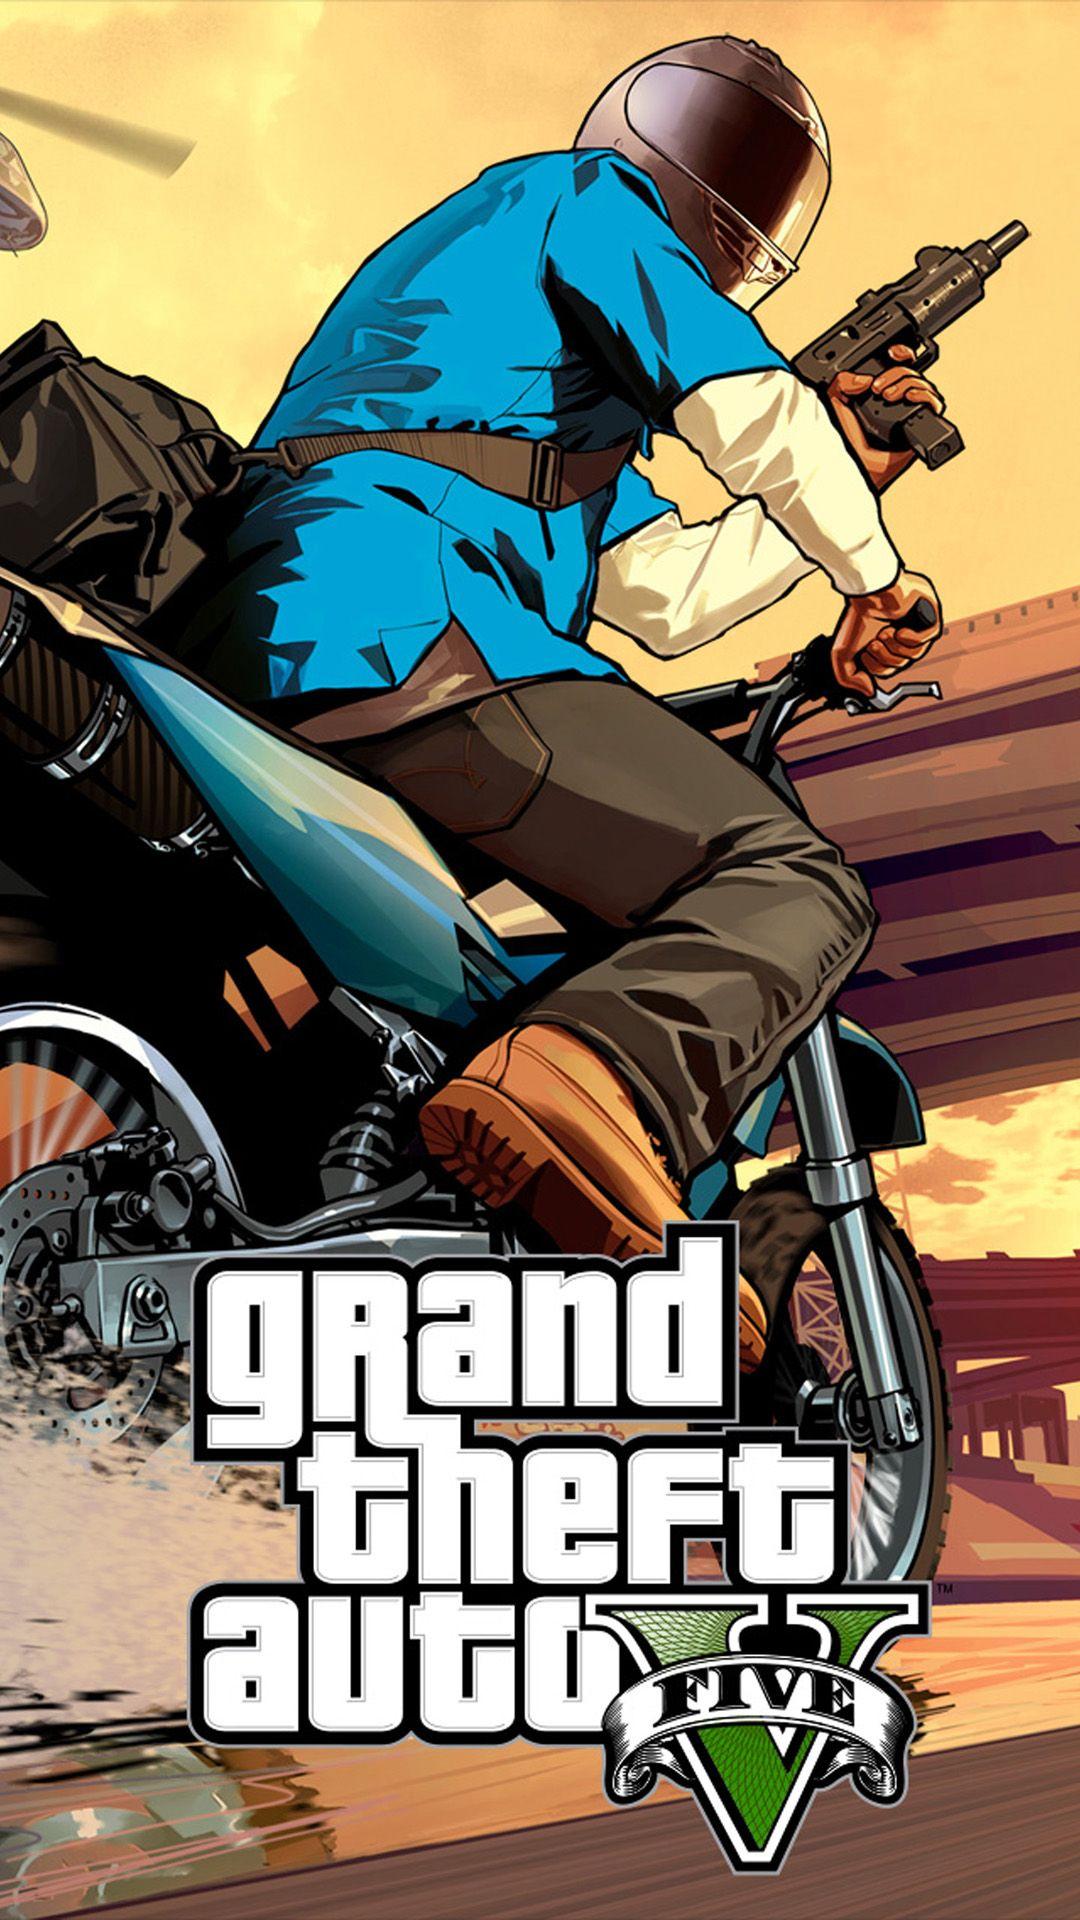 Franklin Gta V Iphone Background In 2020 Grand Theft Auto Artwork Gta Rockstar Games Gta